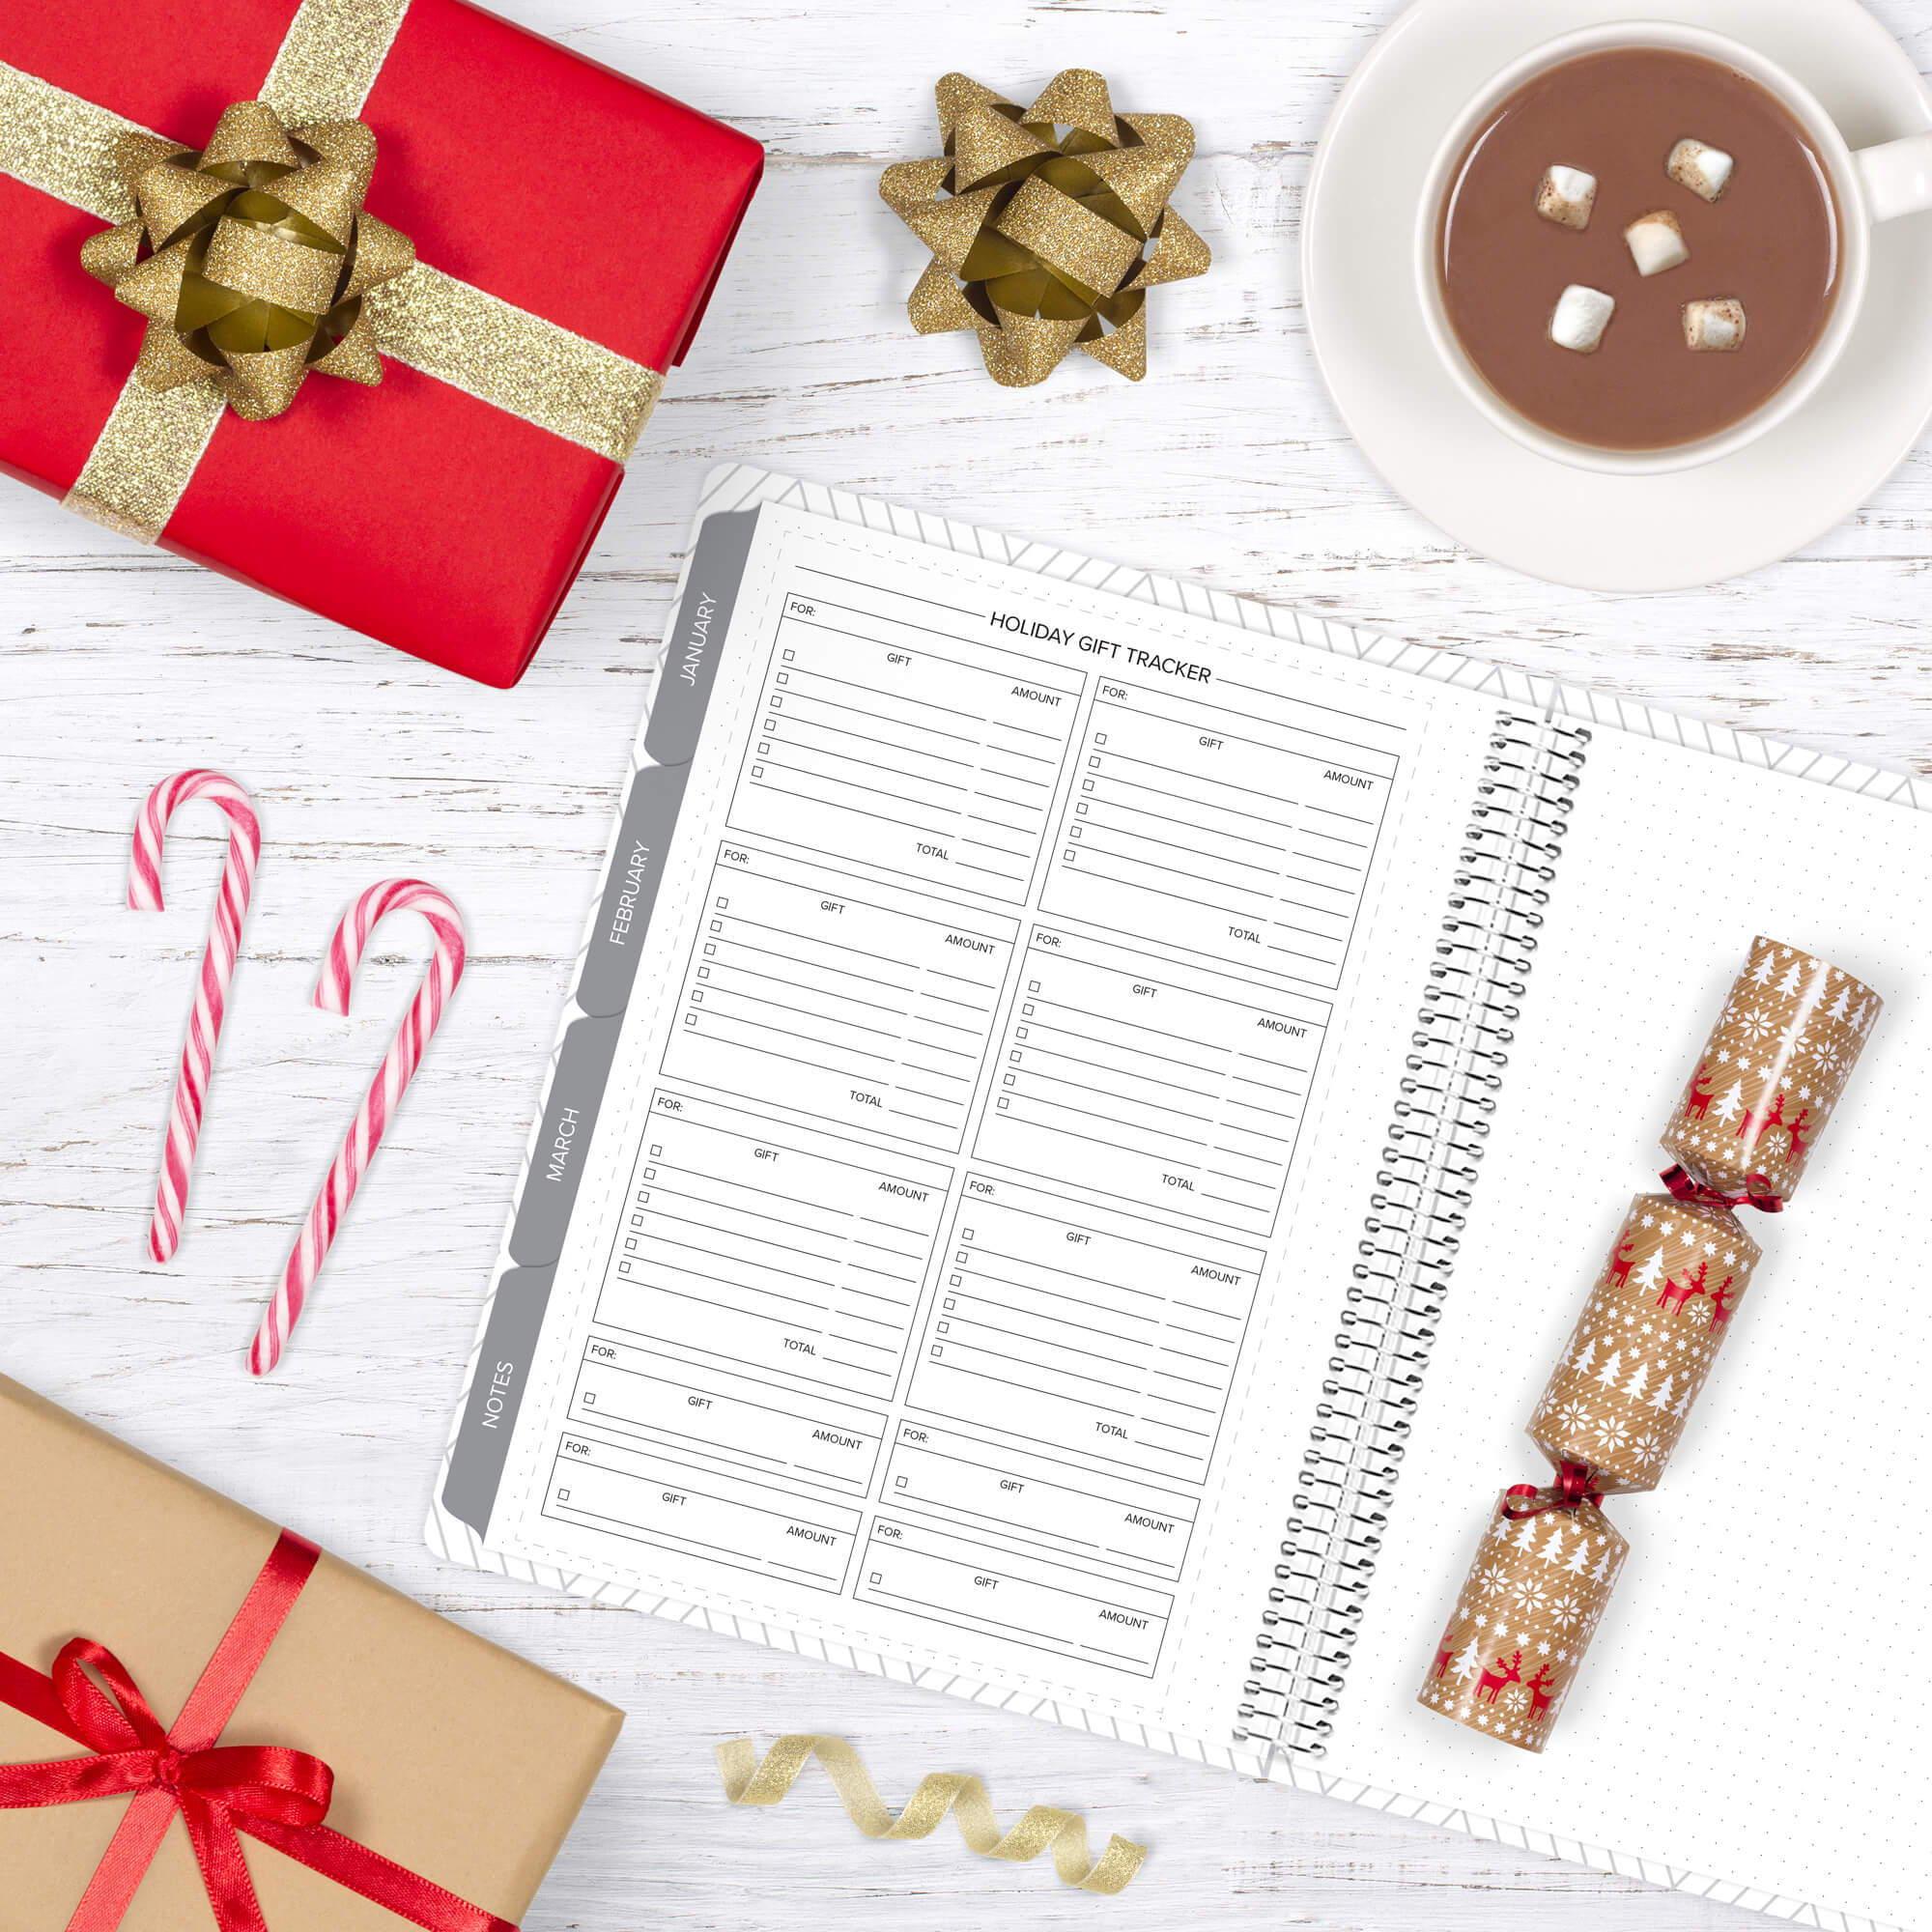 amplify planner holiday gift tracker insert